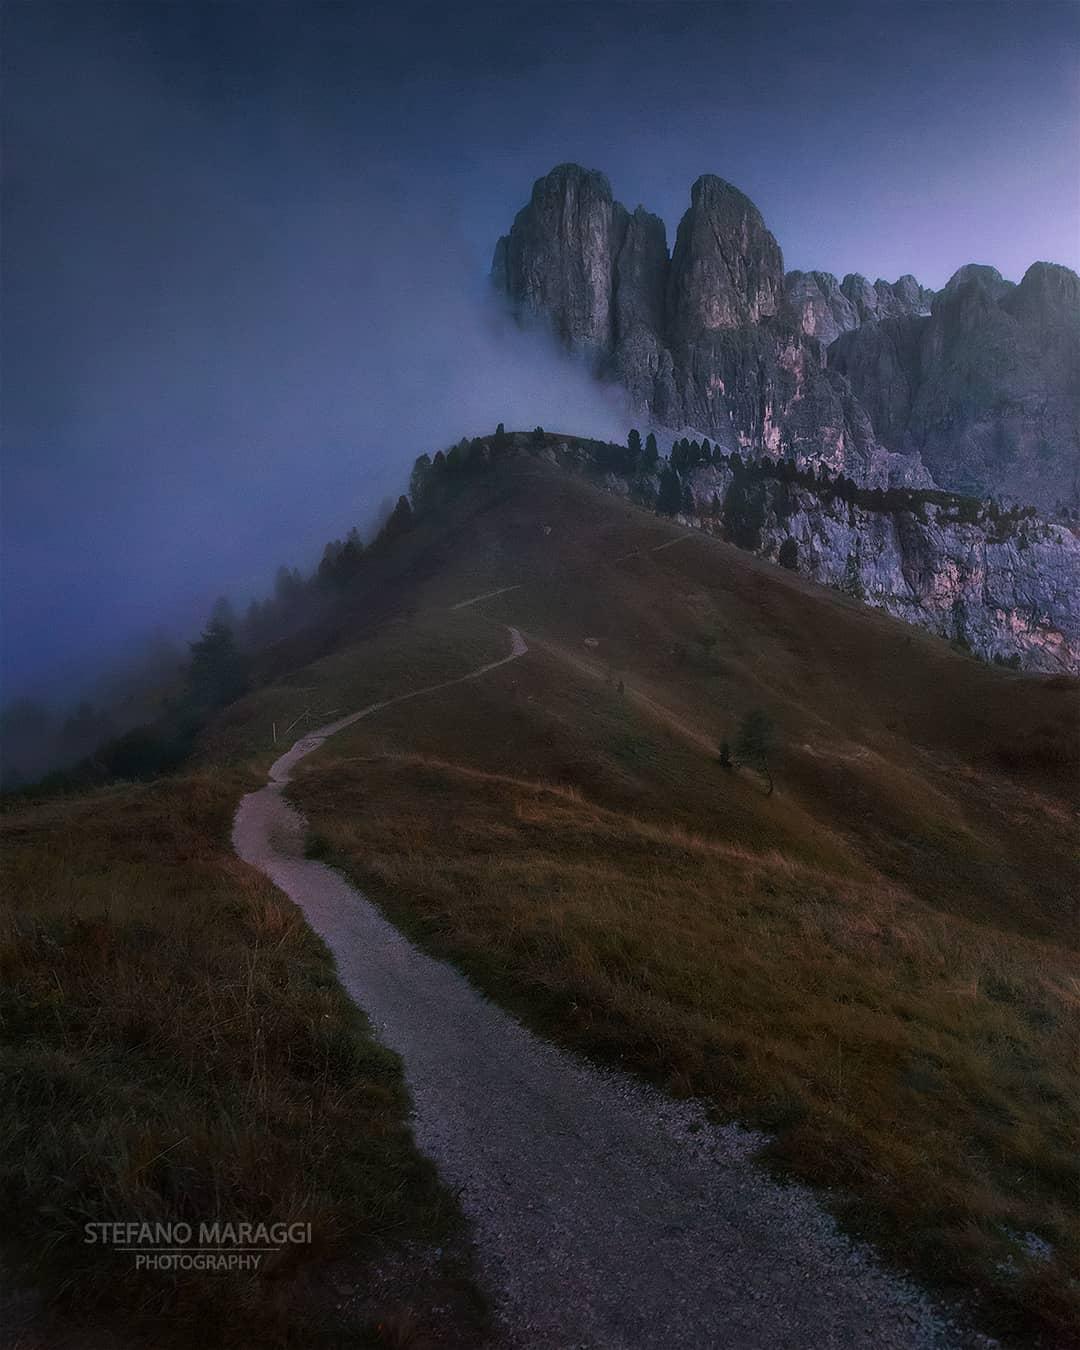 Природа и путешествия на снимках Стефано Мараджи